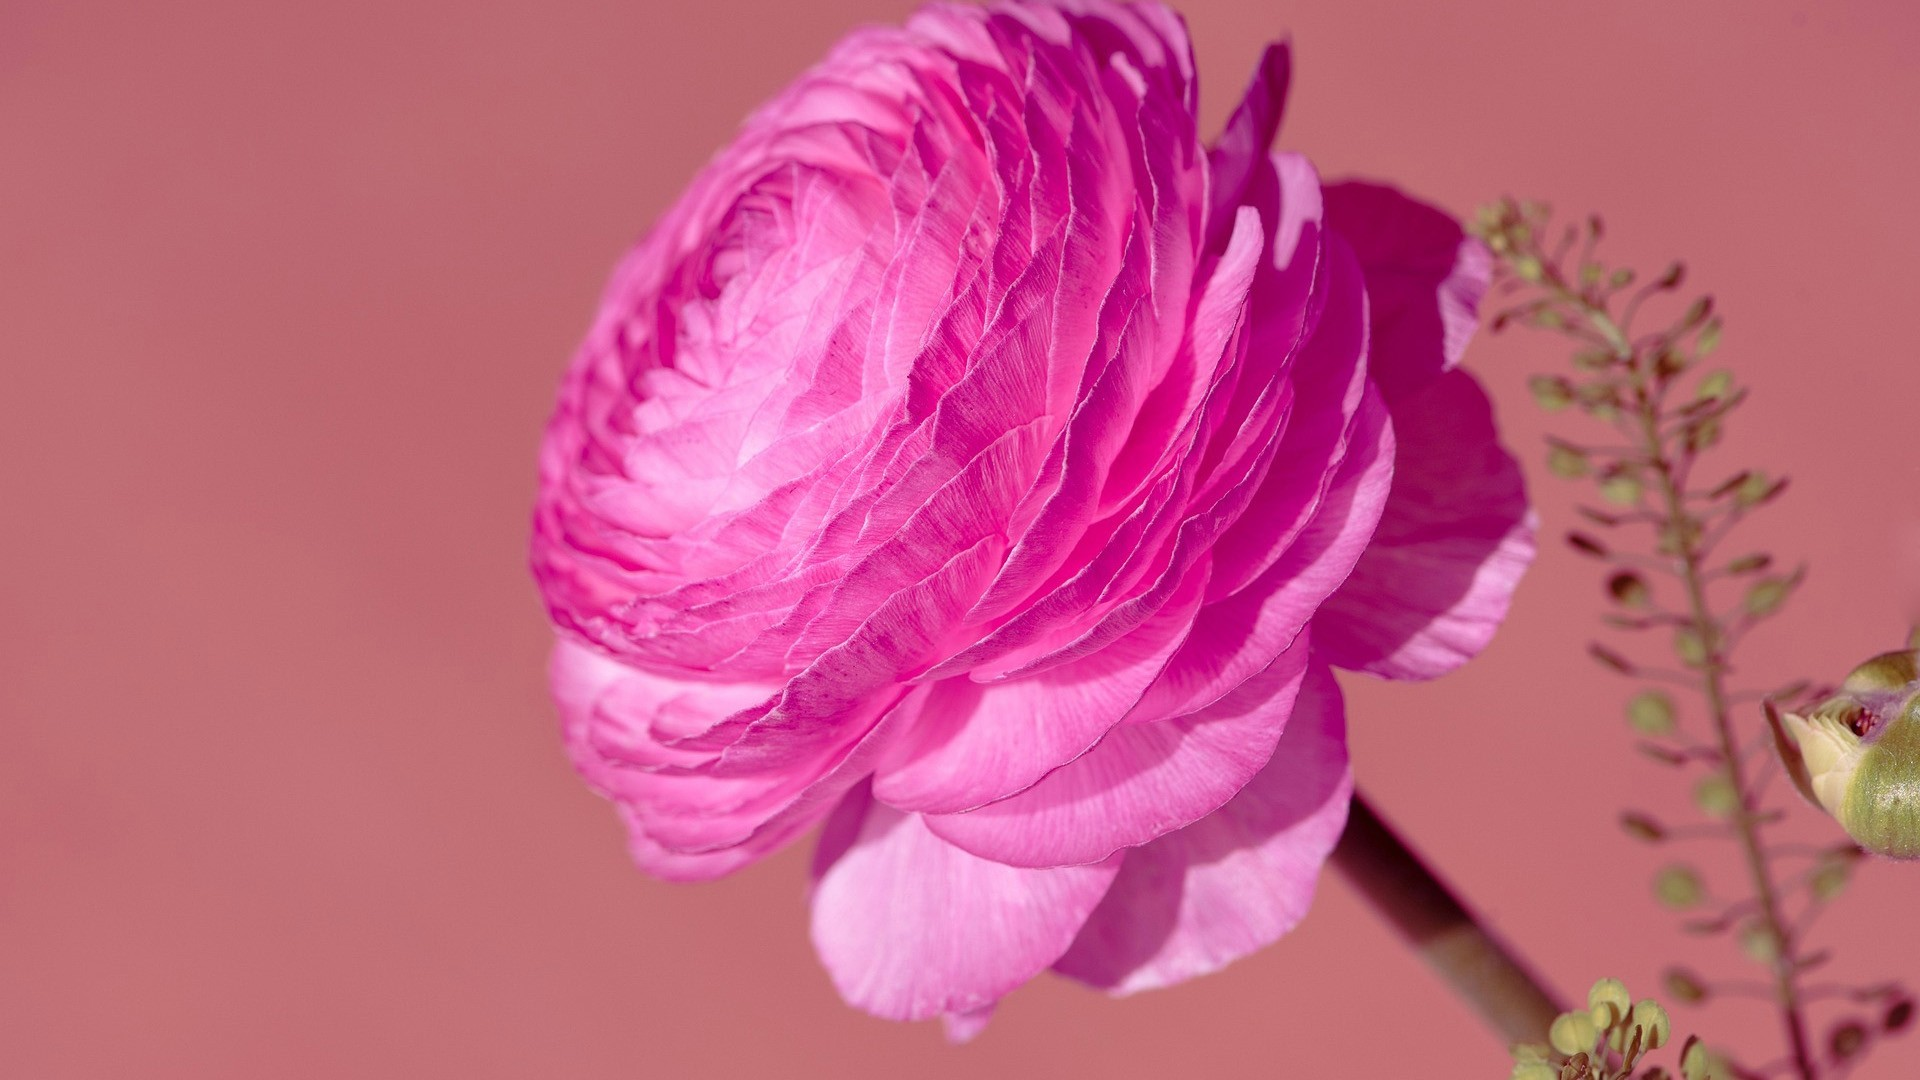 pink ranunculus flower in pink background HD Wallpaper